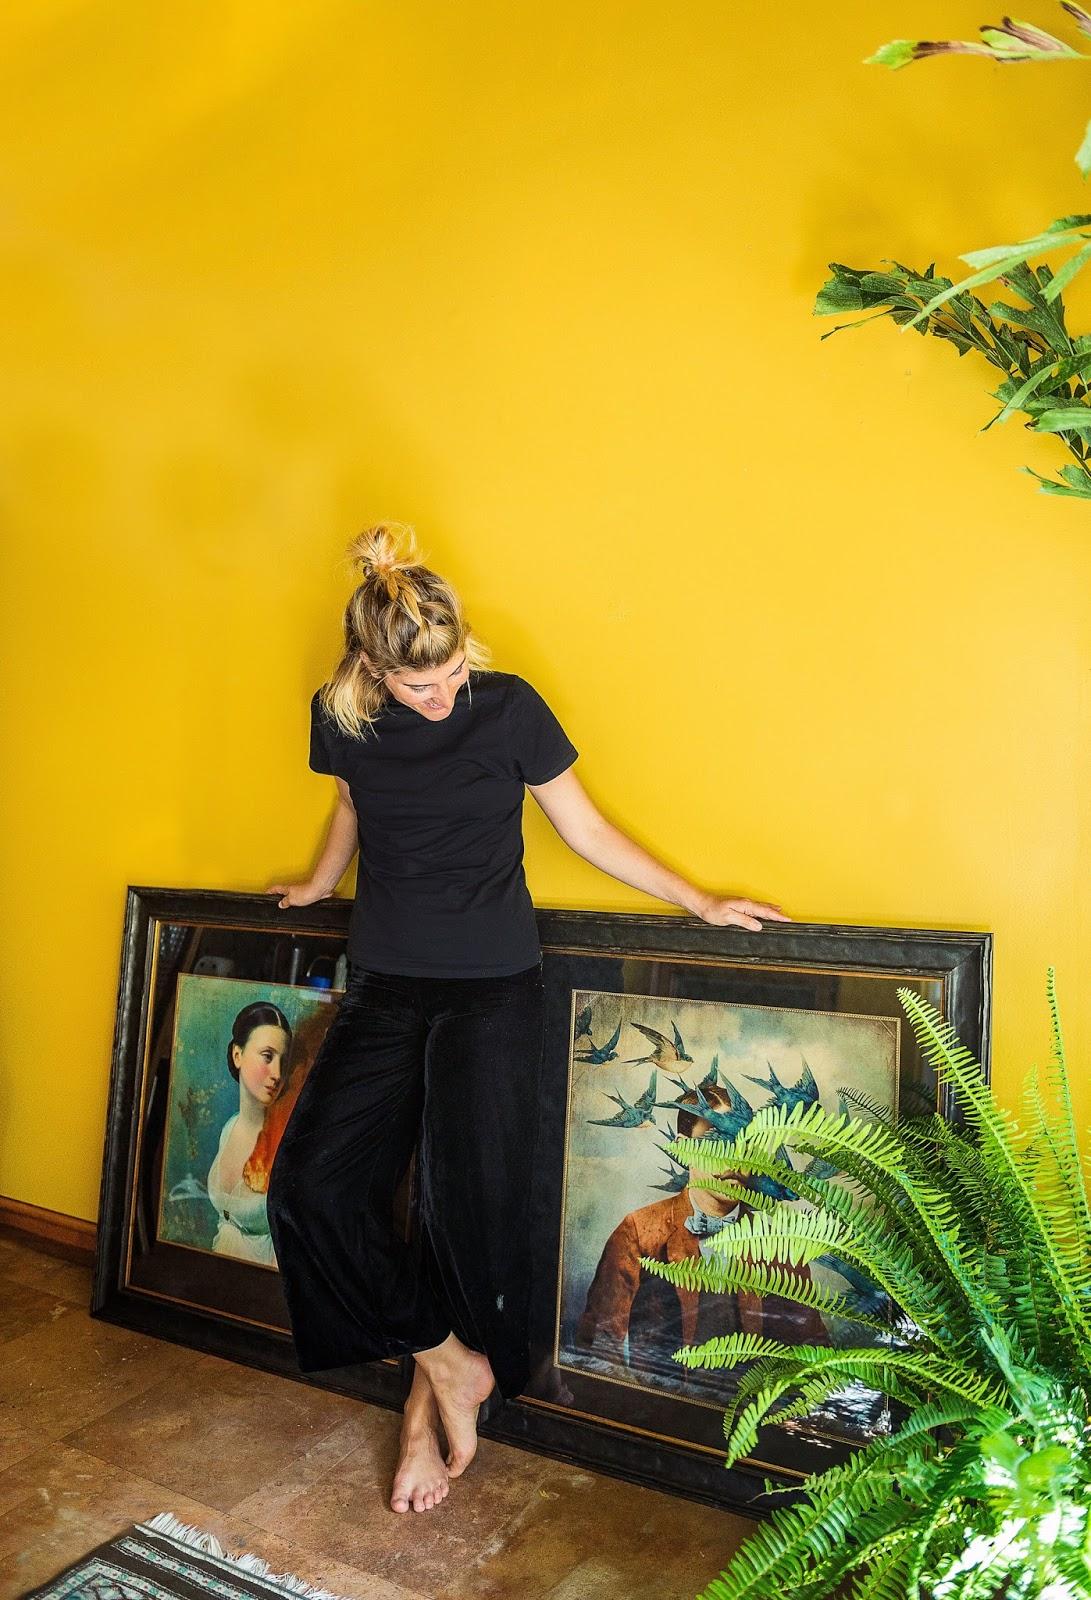 Arte Boheme, Society 6 , Miami Decor, interior design, Interior Design Miami, Federica Molini